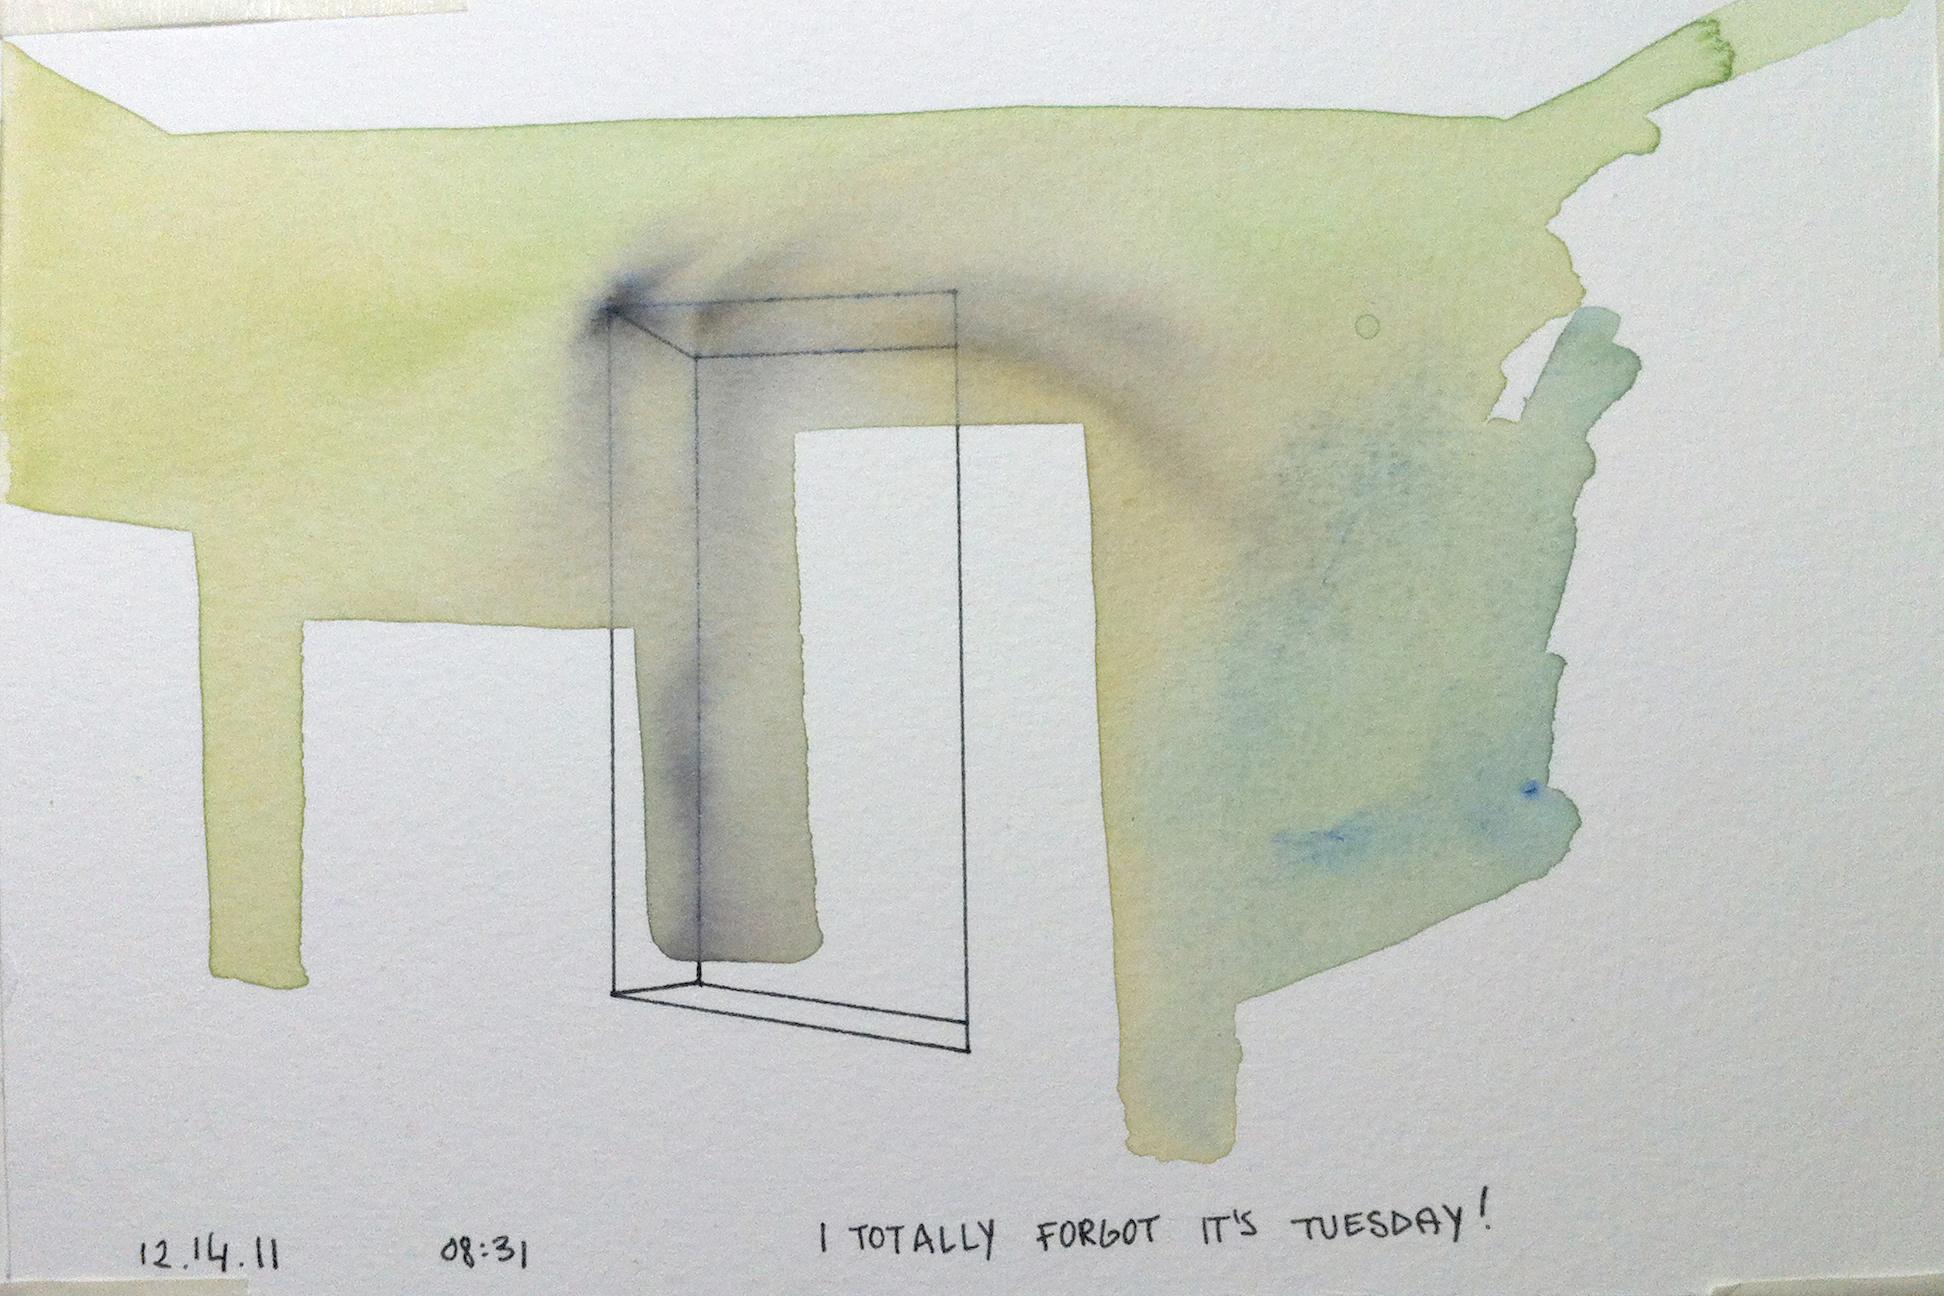 2011-11-25 drawing05.jpg